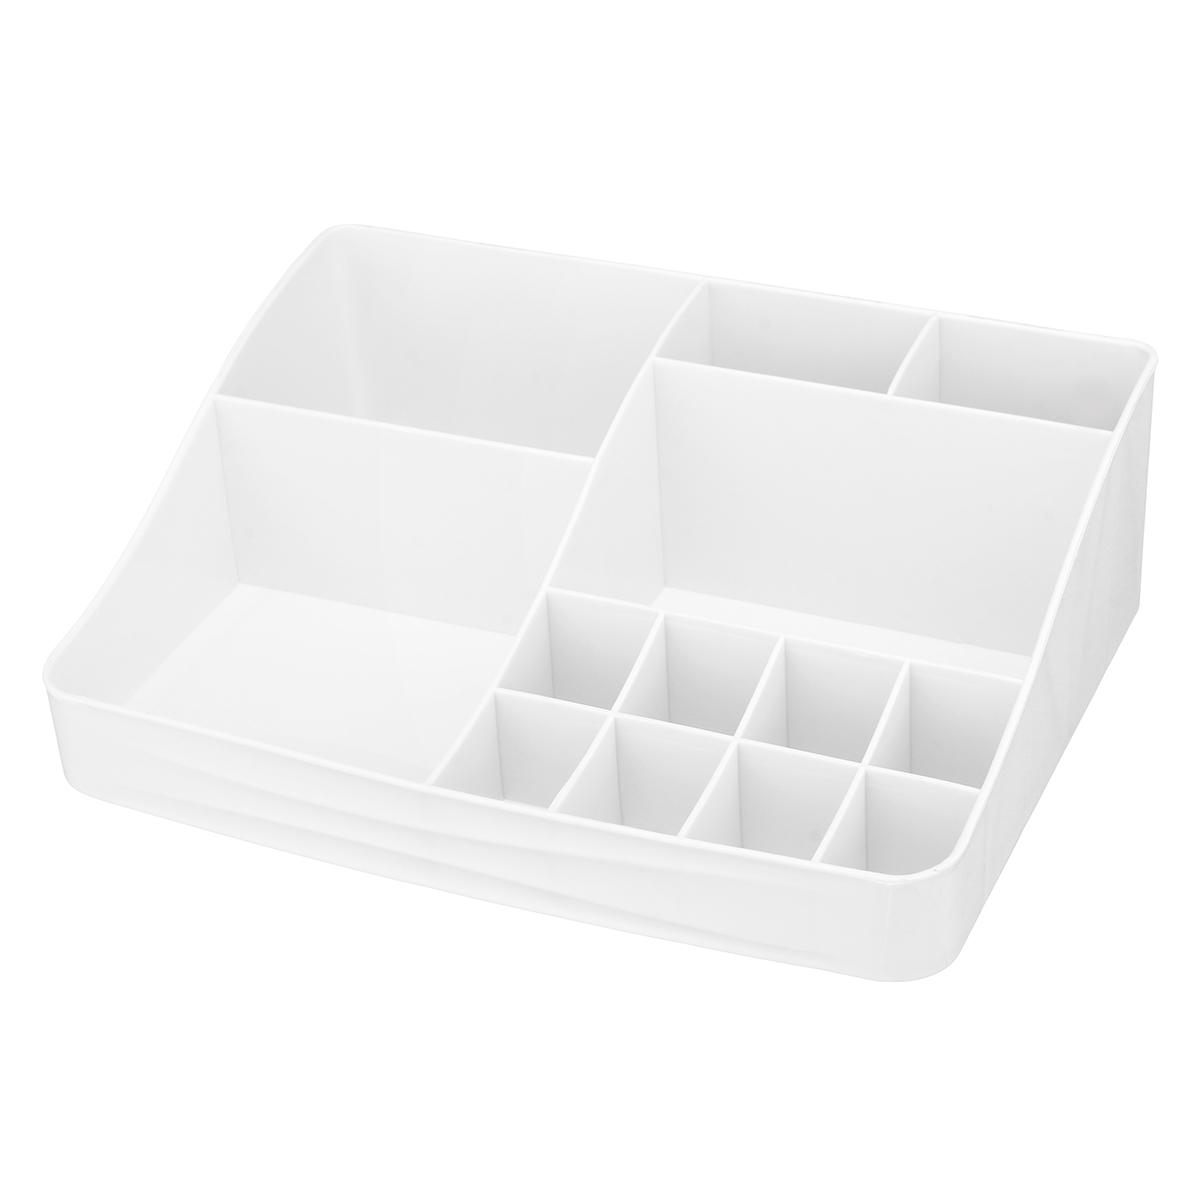 Plastic Cosmetic Box Drawer Makeup Organizer Makeup Desktop Storage Box Container Nail Casket Holder Jewelry Organizer Desktop Organizer